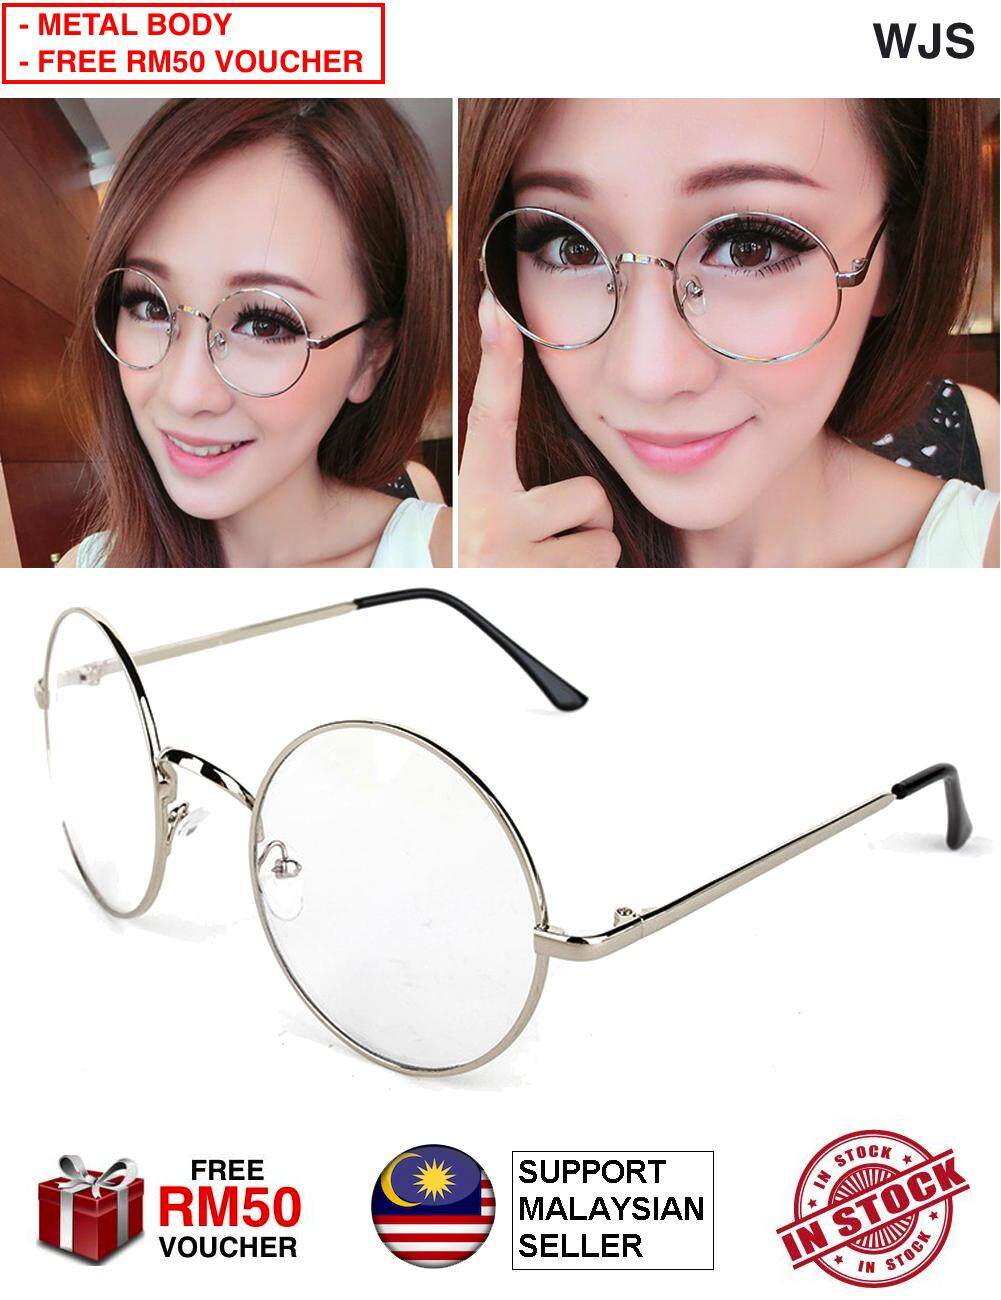 (SMART LOOKING) WJS Round Glasses Dress Up Spectacles Fashion Glass Specs Sunglass Sunglasses Harry Potter Korean Fashion Korea Black Bronze Gold Silver [FREE RM 50 VOUCHER]